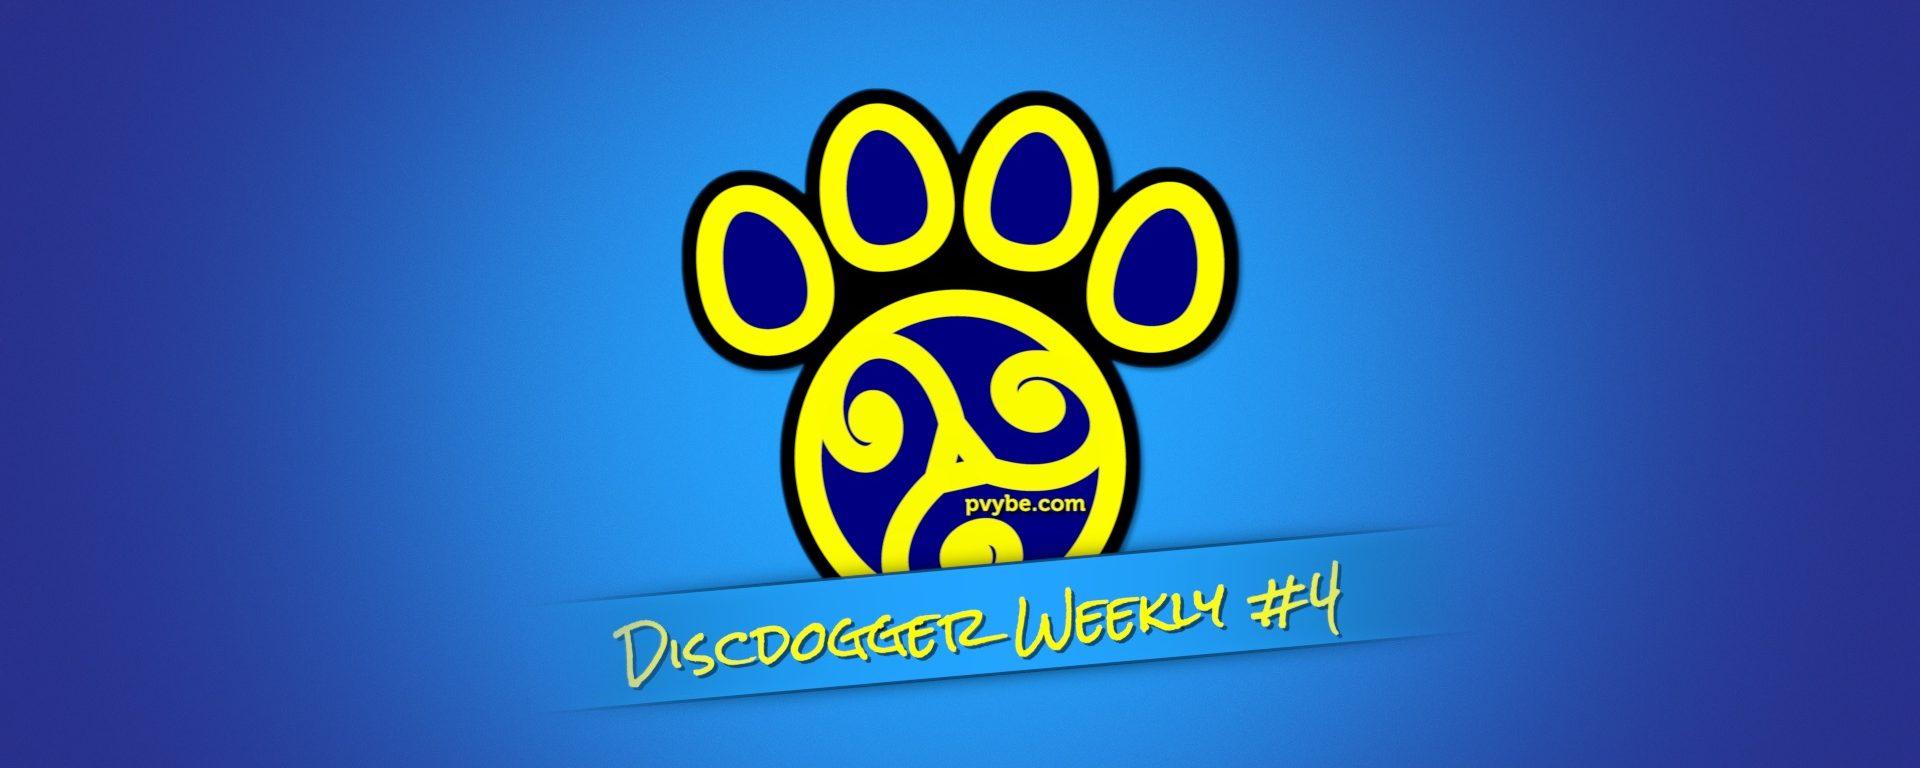 DiscDogger Weekly #4